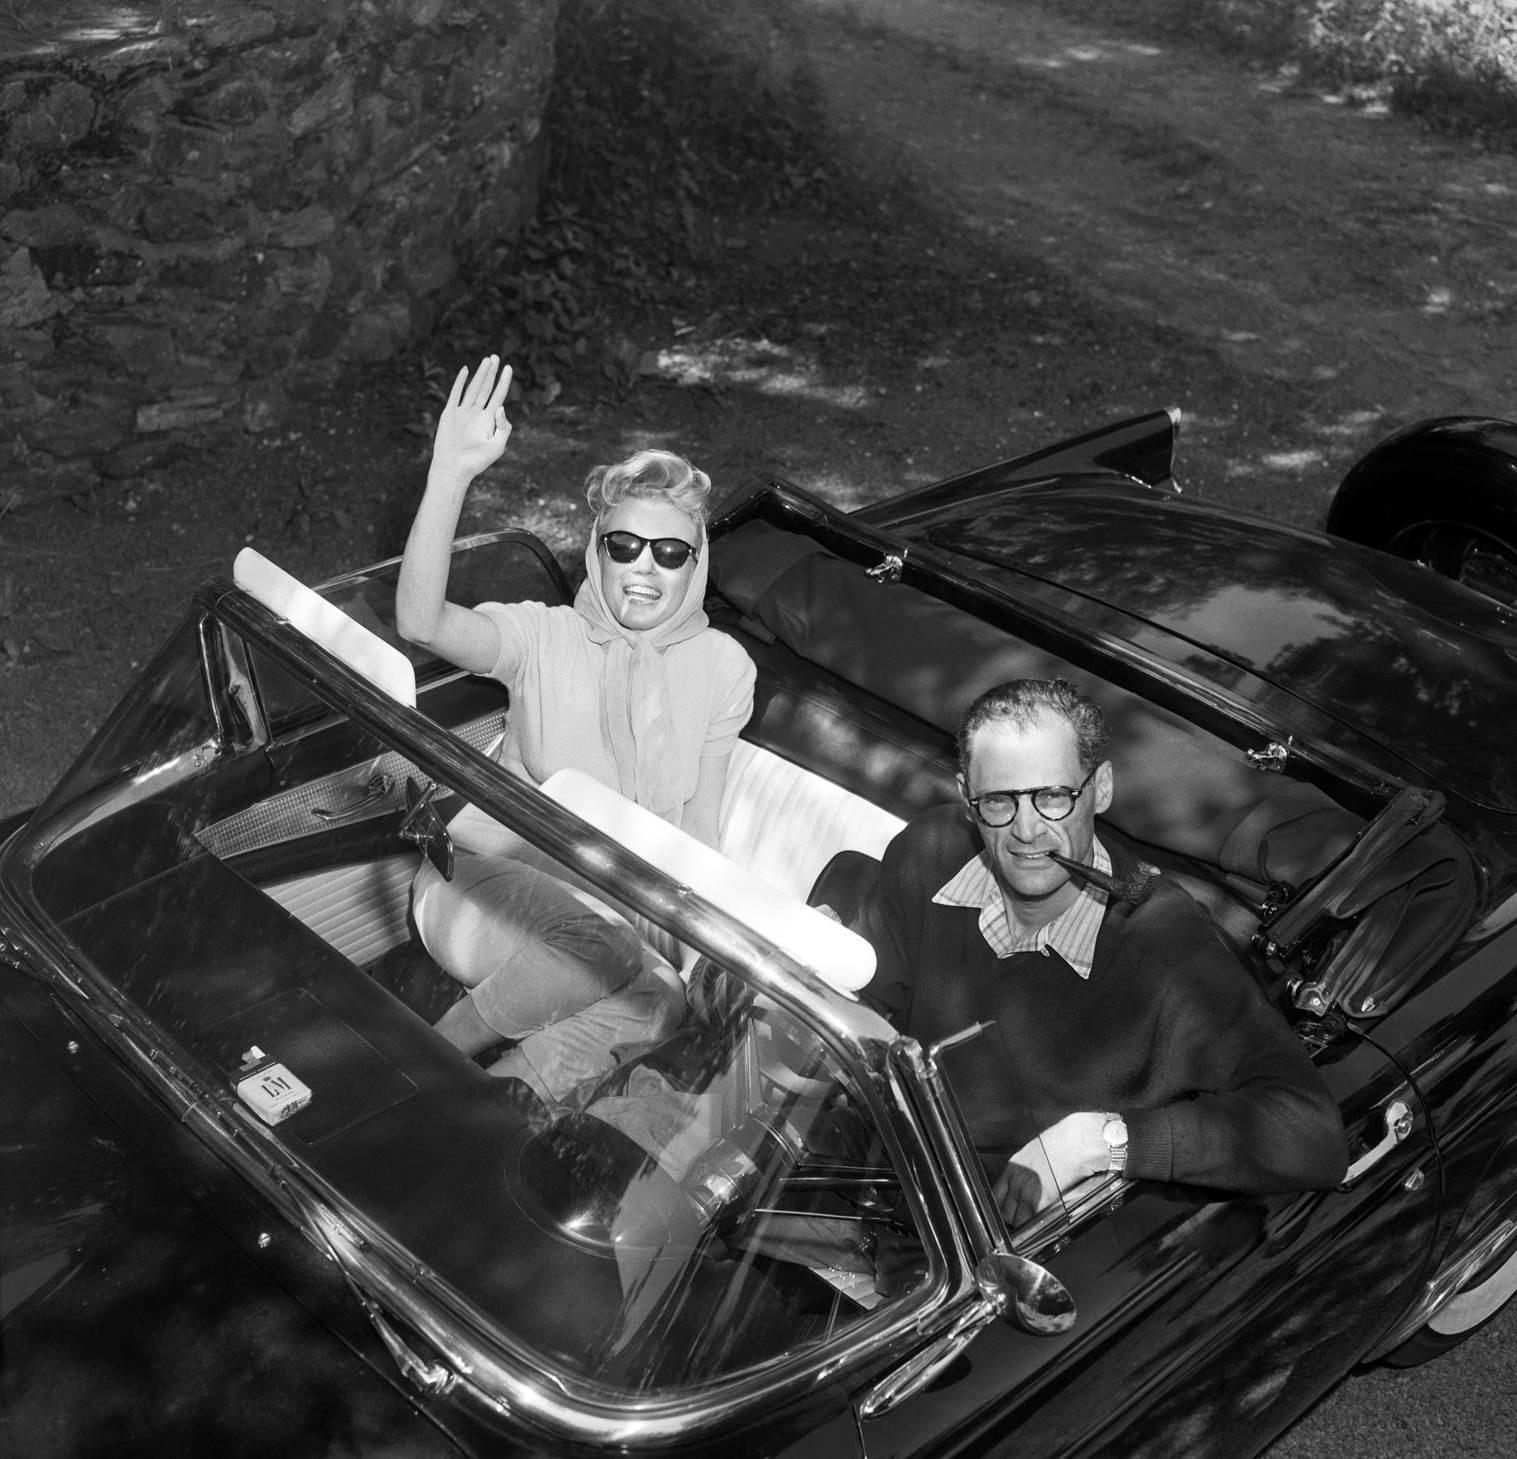 http://2.bp.blogspot.com/-MNOfxe4wUZ4/TfFq3oc_nwI/AAAAAAAAAMM/GJz2sRV4yQI/s1600/Marilyn+Monroe+and+Arthur+Miller+1956+p.jpg